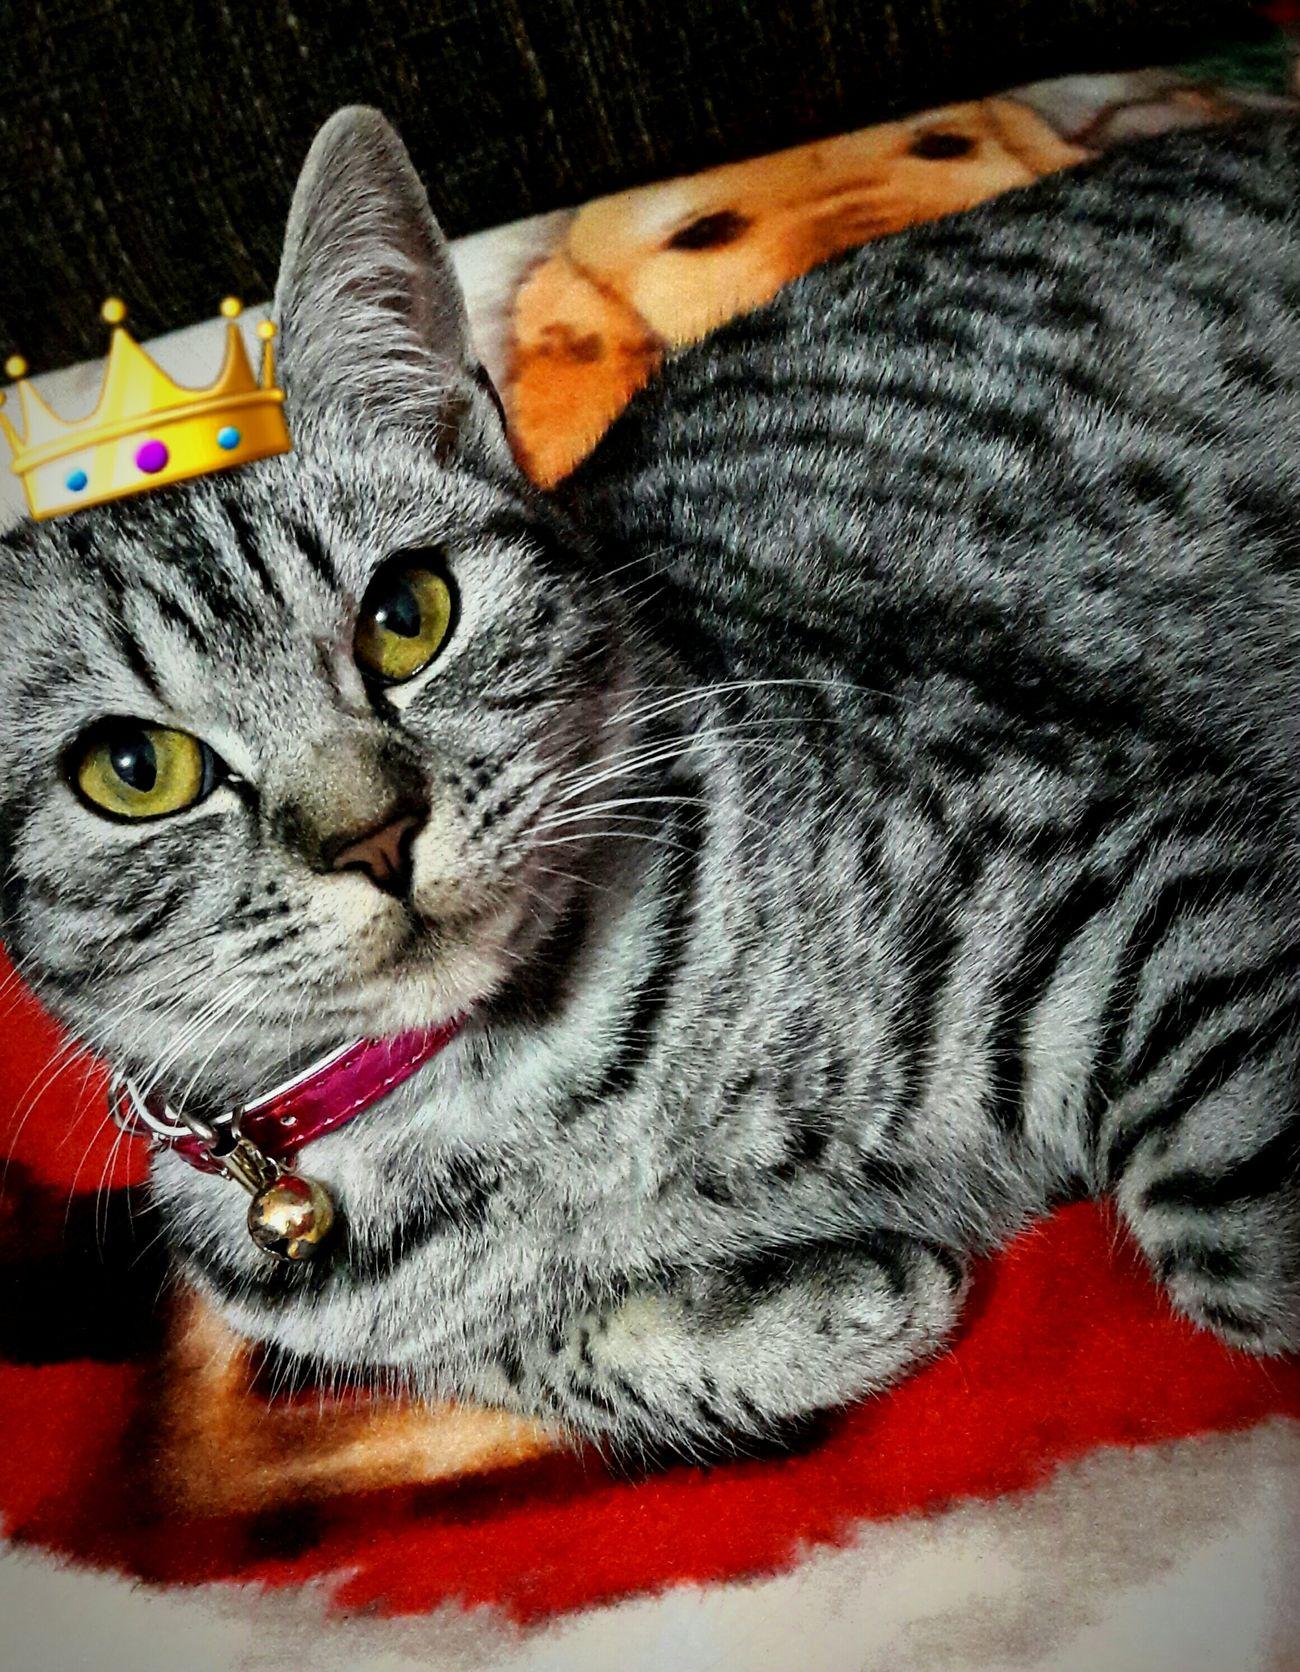 Cats are royal pets❤ Feline Pets Lovely Misha Kitty First Eyeem Photo